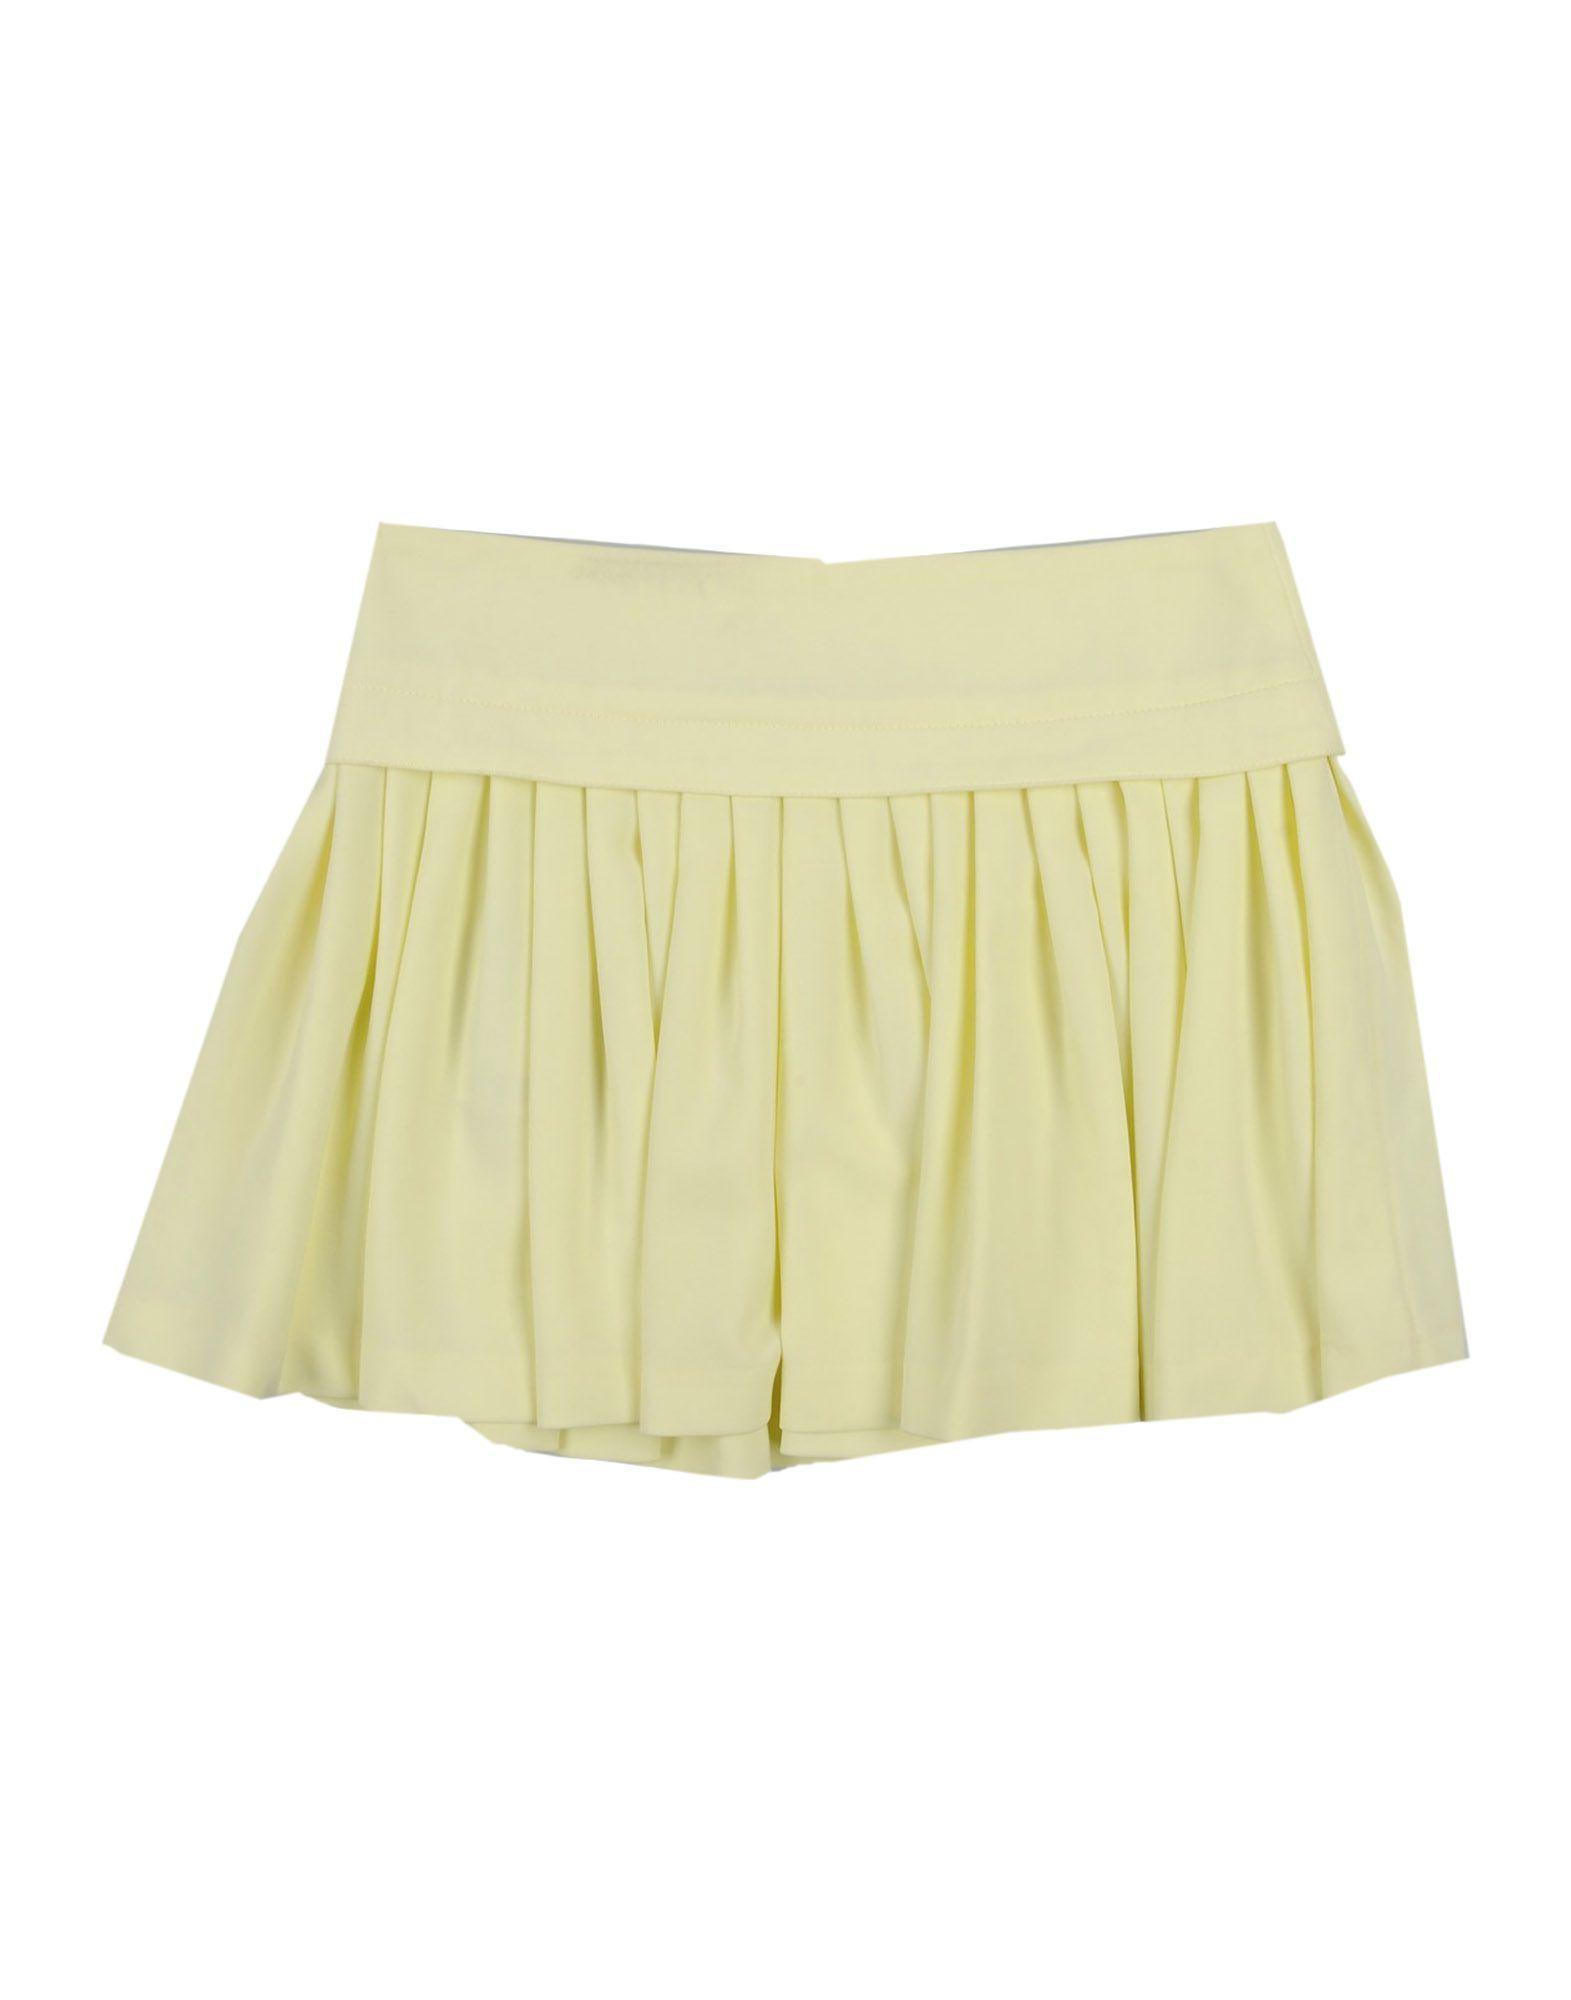 SKIRTS Miss Blumarine Yellow Girl Polyester